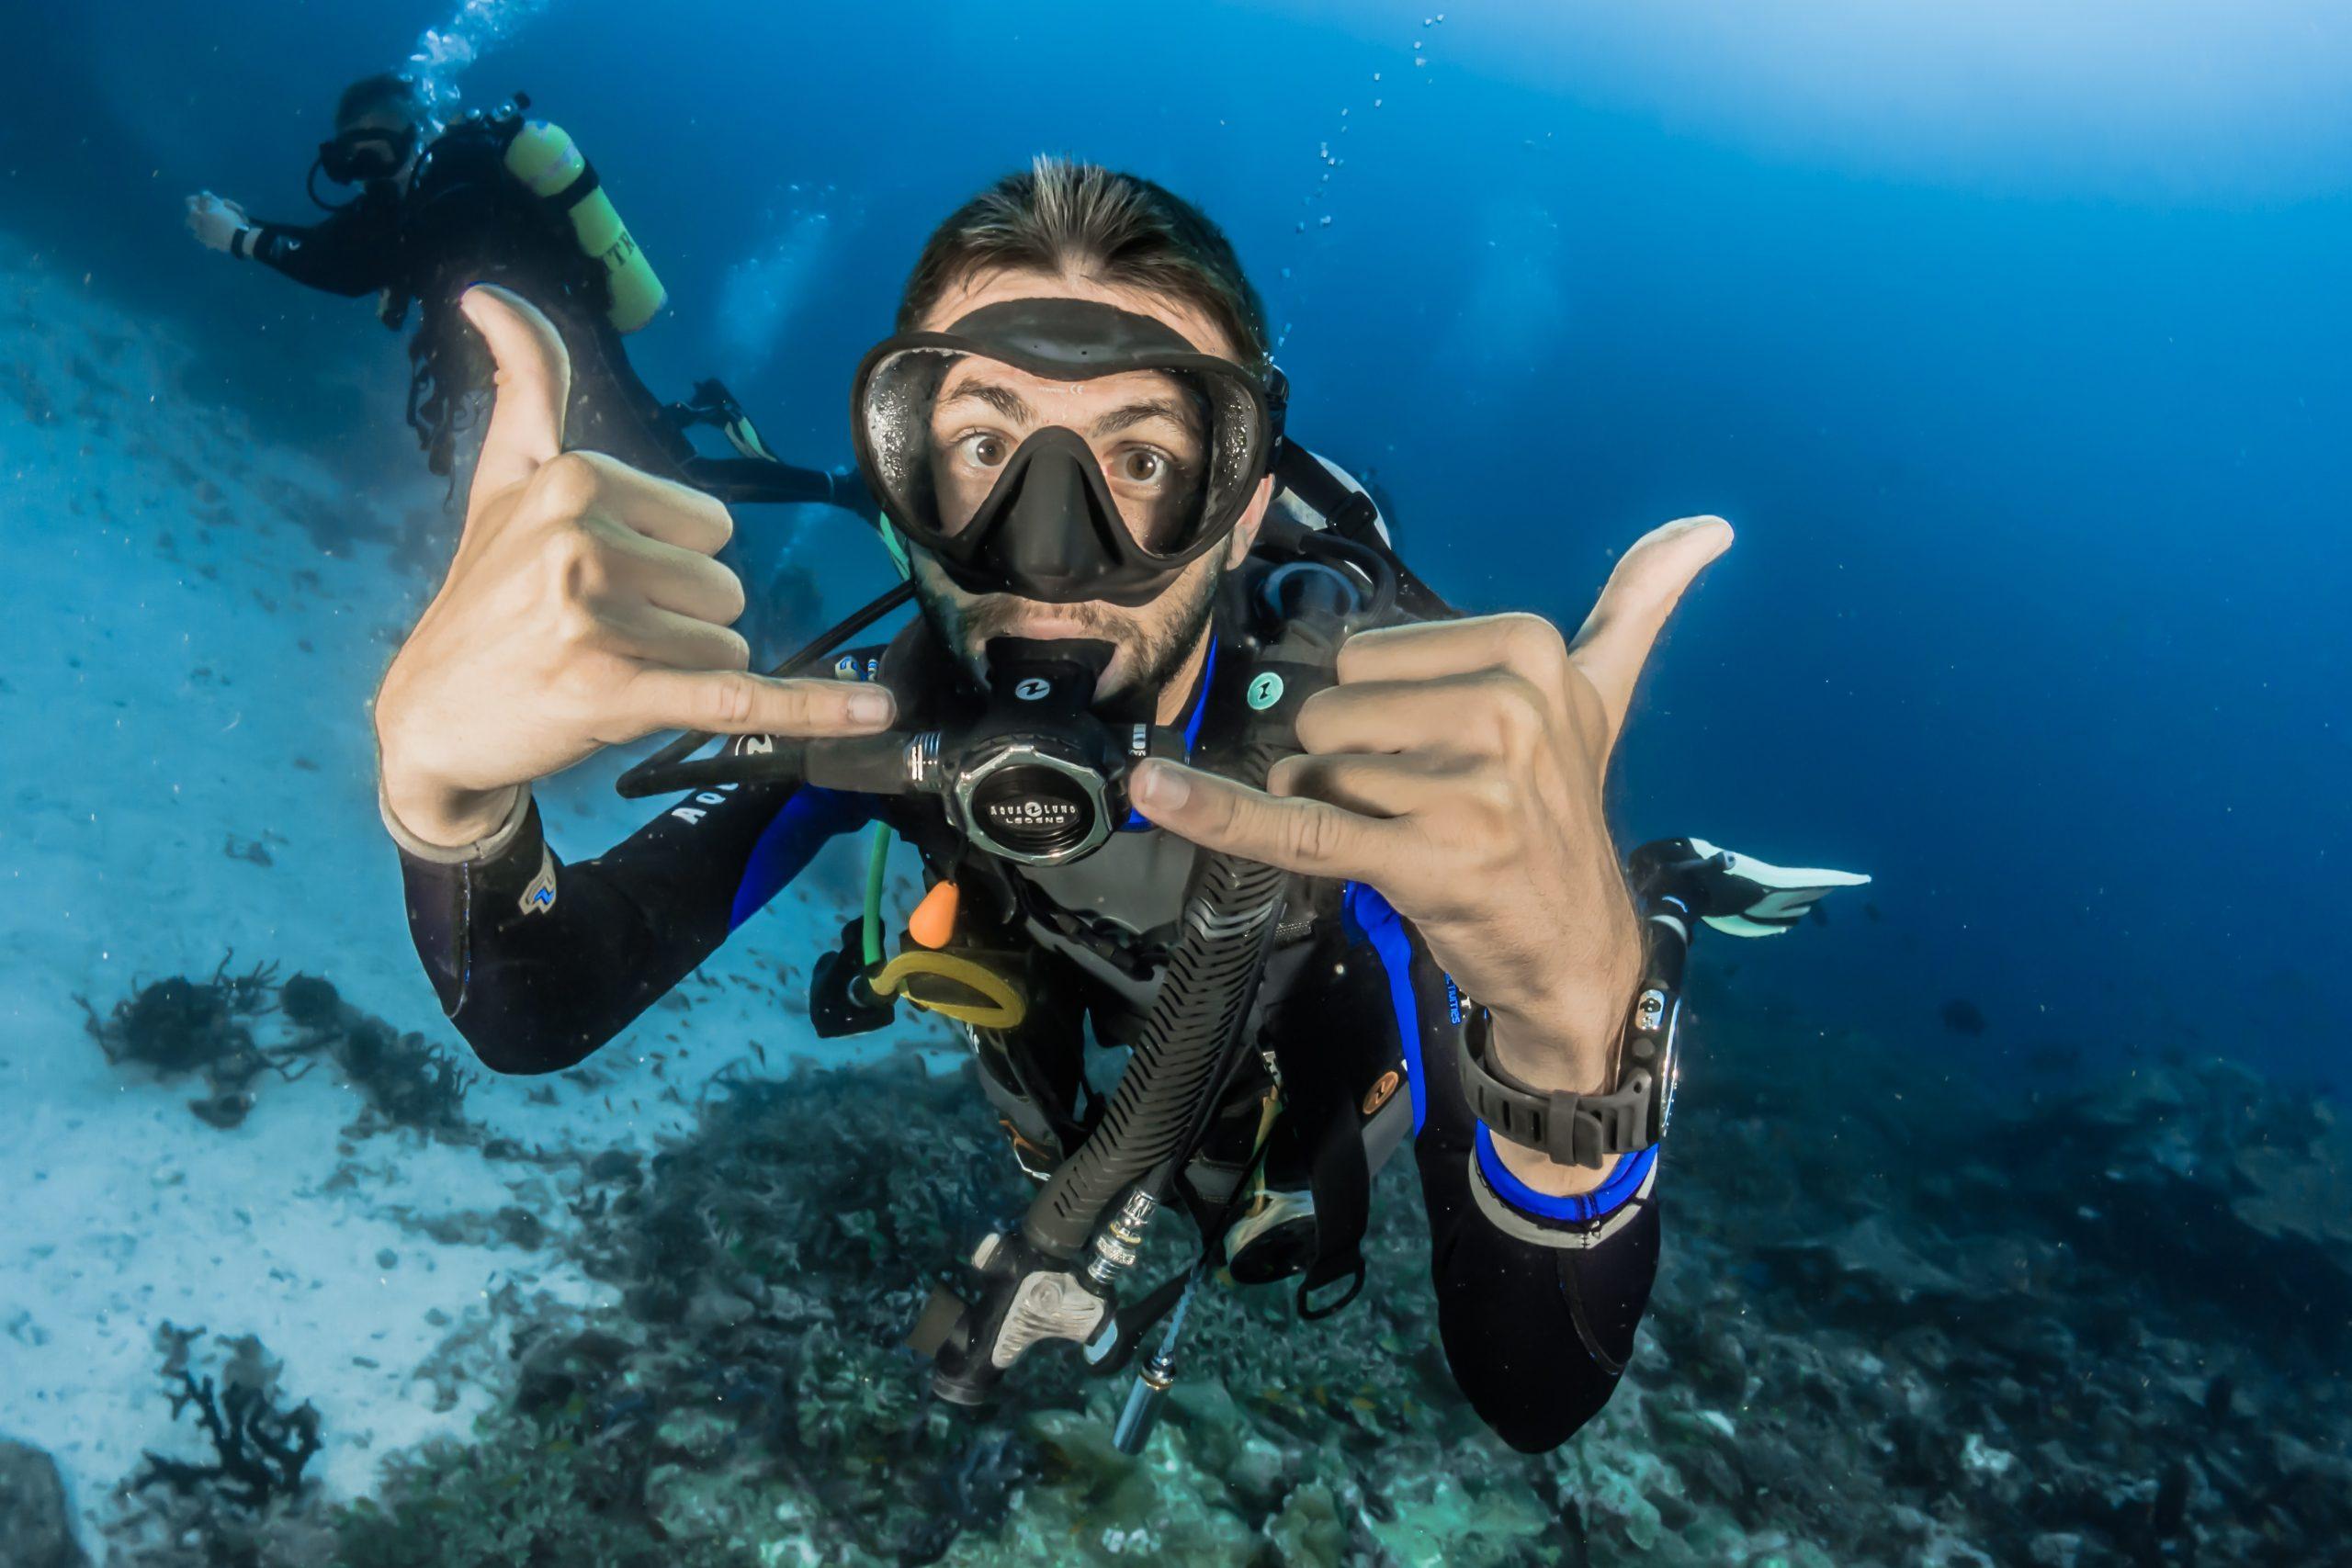 SDI Night & Limited Visibility Diver